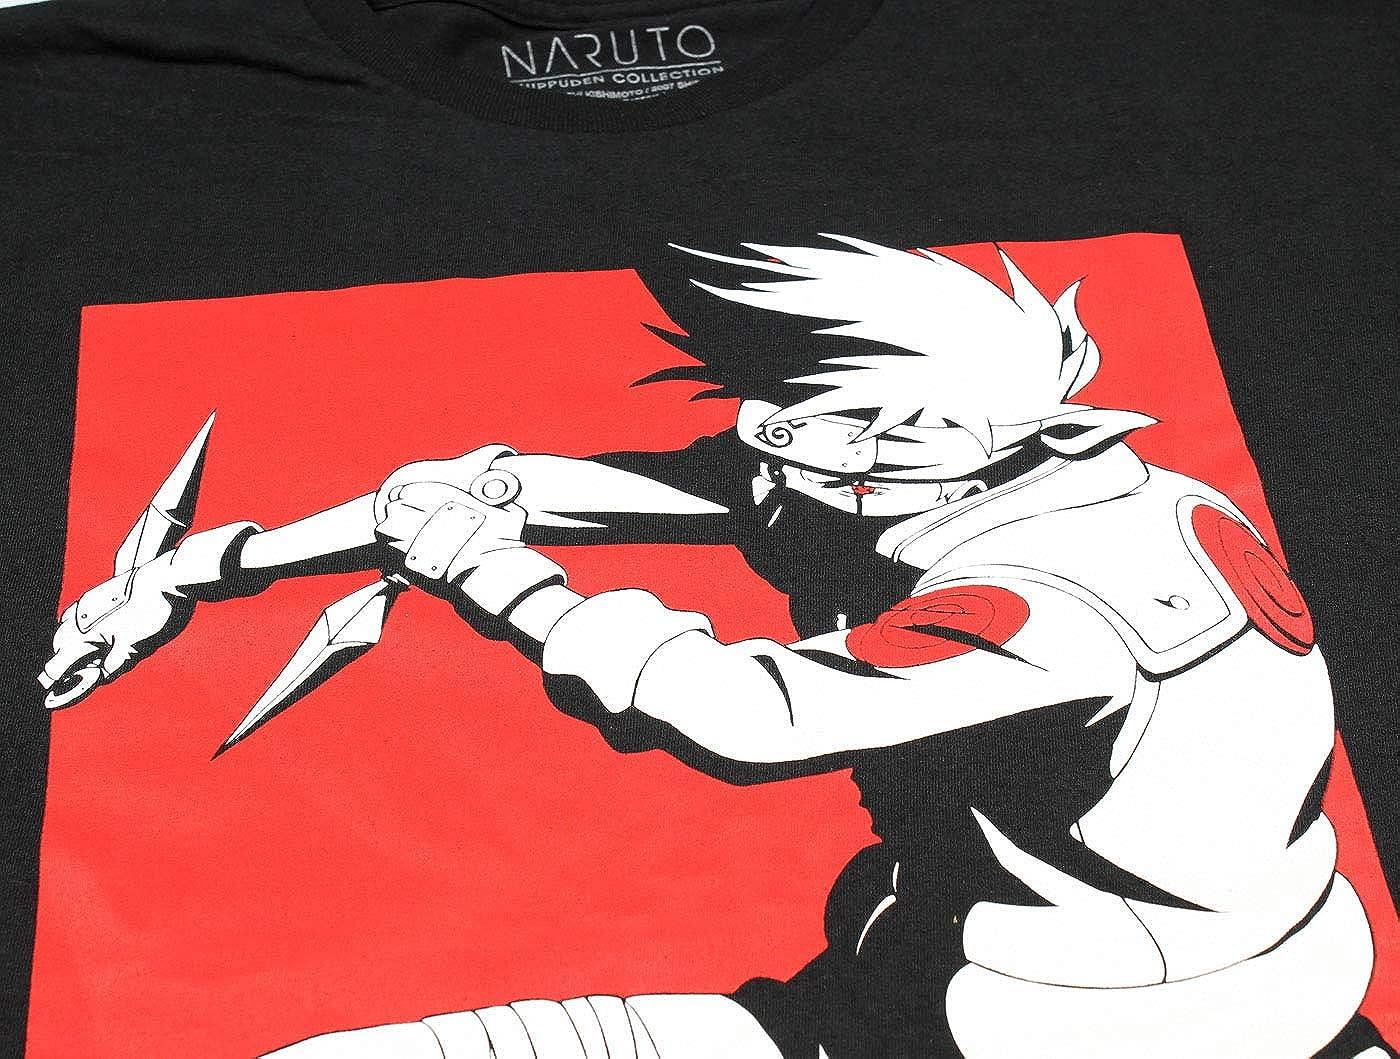 Fashion Naruto Shirt Mens Kakashi Red Out Team 7 Leader Licensed Character T-Shirt